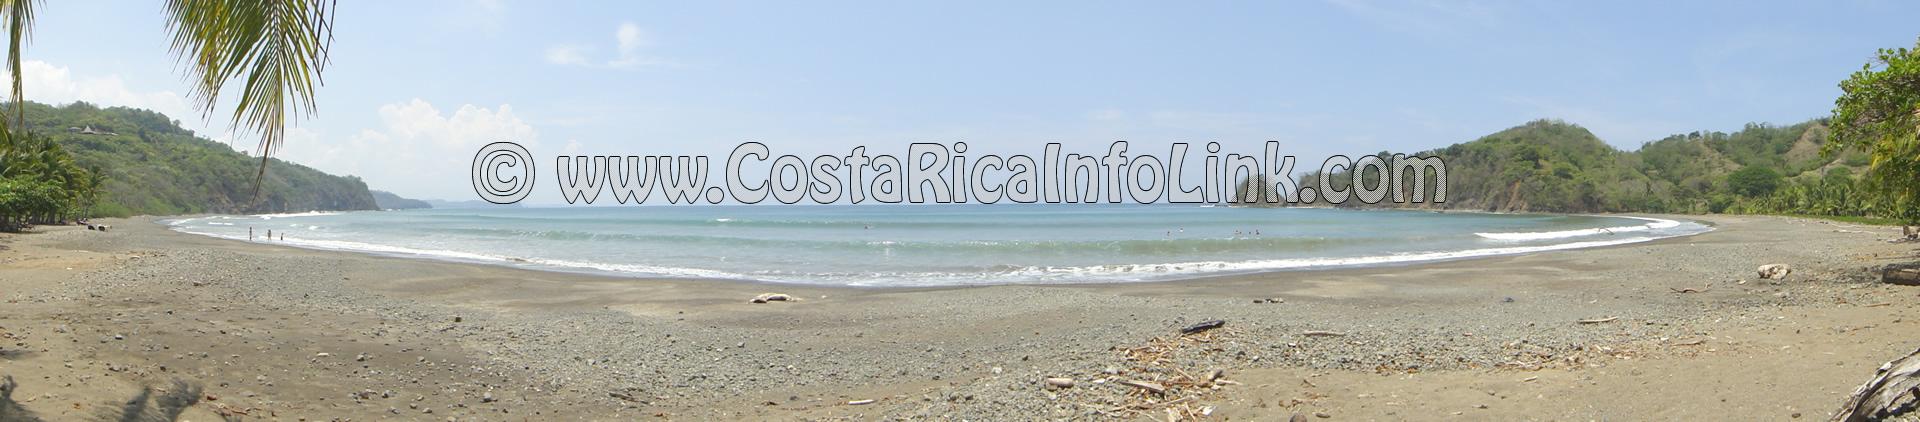 Playa Islita Costa Rica Panoramica